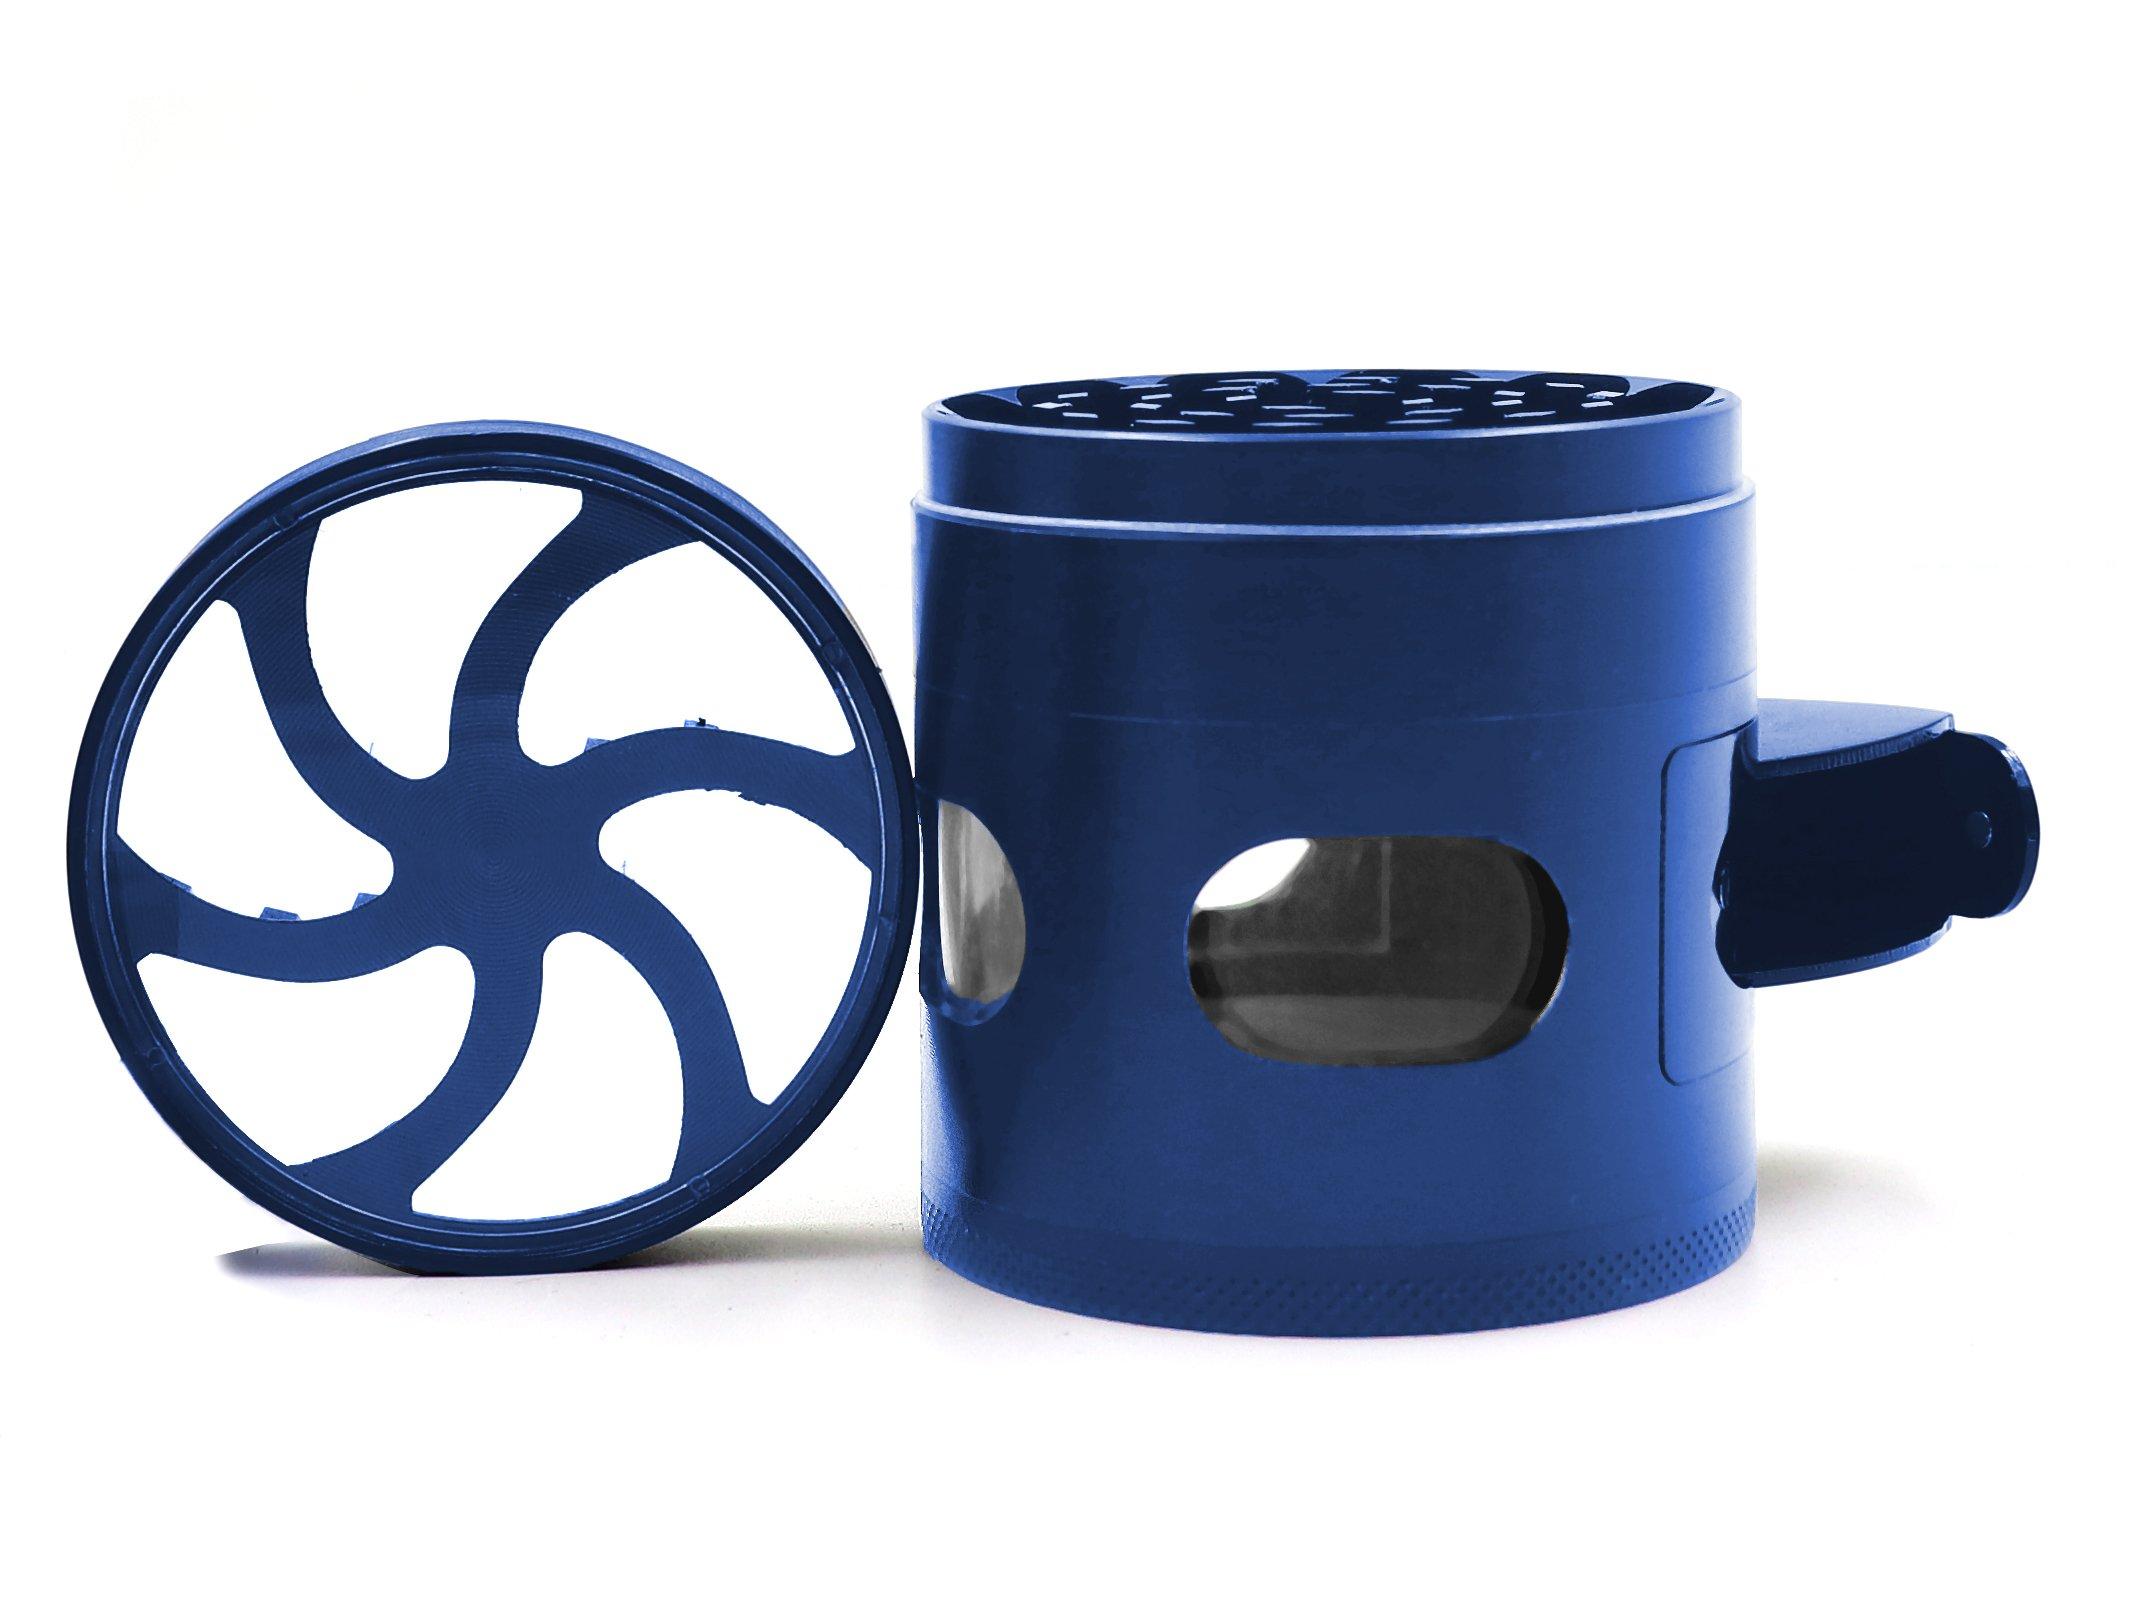 AIMAKE New Design Herb Weed& Spice 4 Piece Large 2.5 Inches Flash Windows Mills Grinder with Pollen Catcher(Blue)